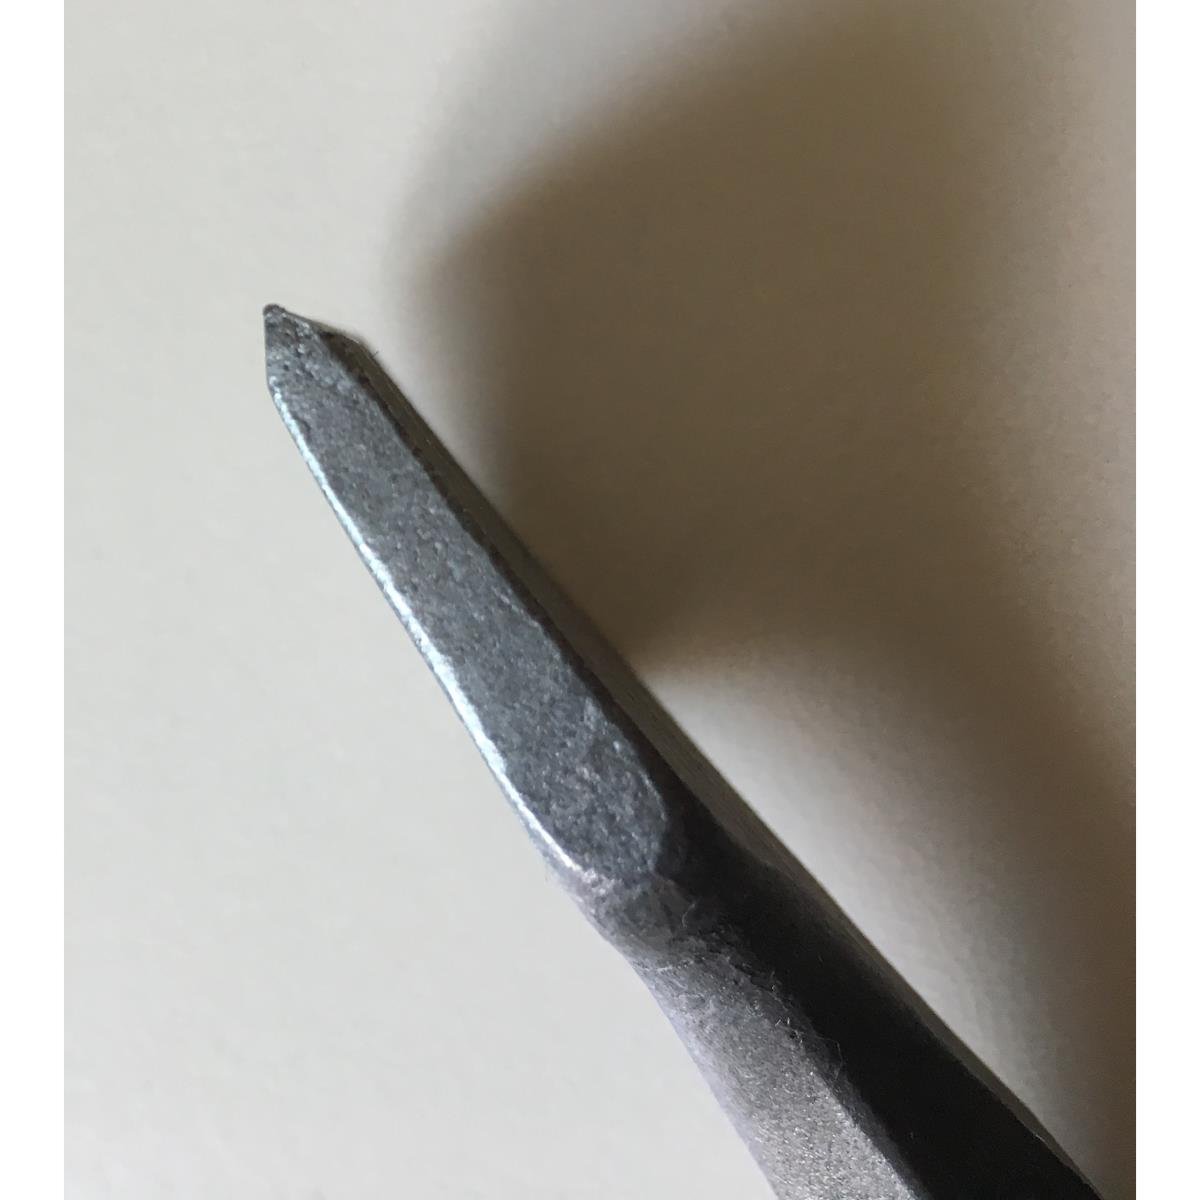 SDS Plus Flachmeissel Breitmeißel 60 breit x 250 mm lang Fliesenmeißel Meißel,Fast,4056, 5907078940564